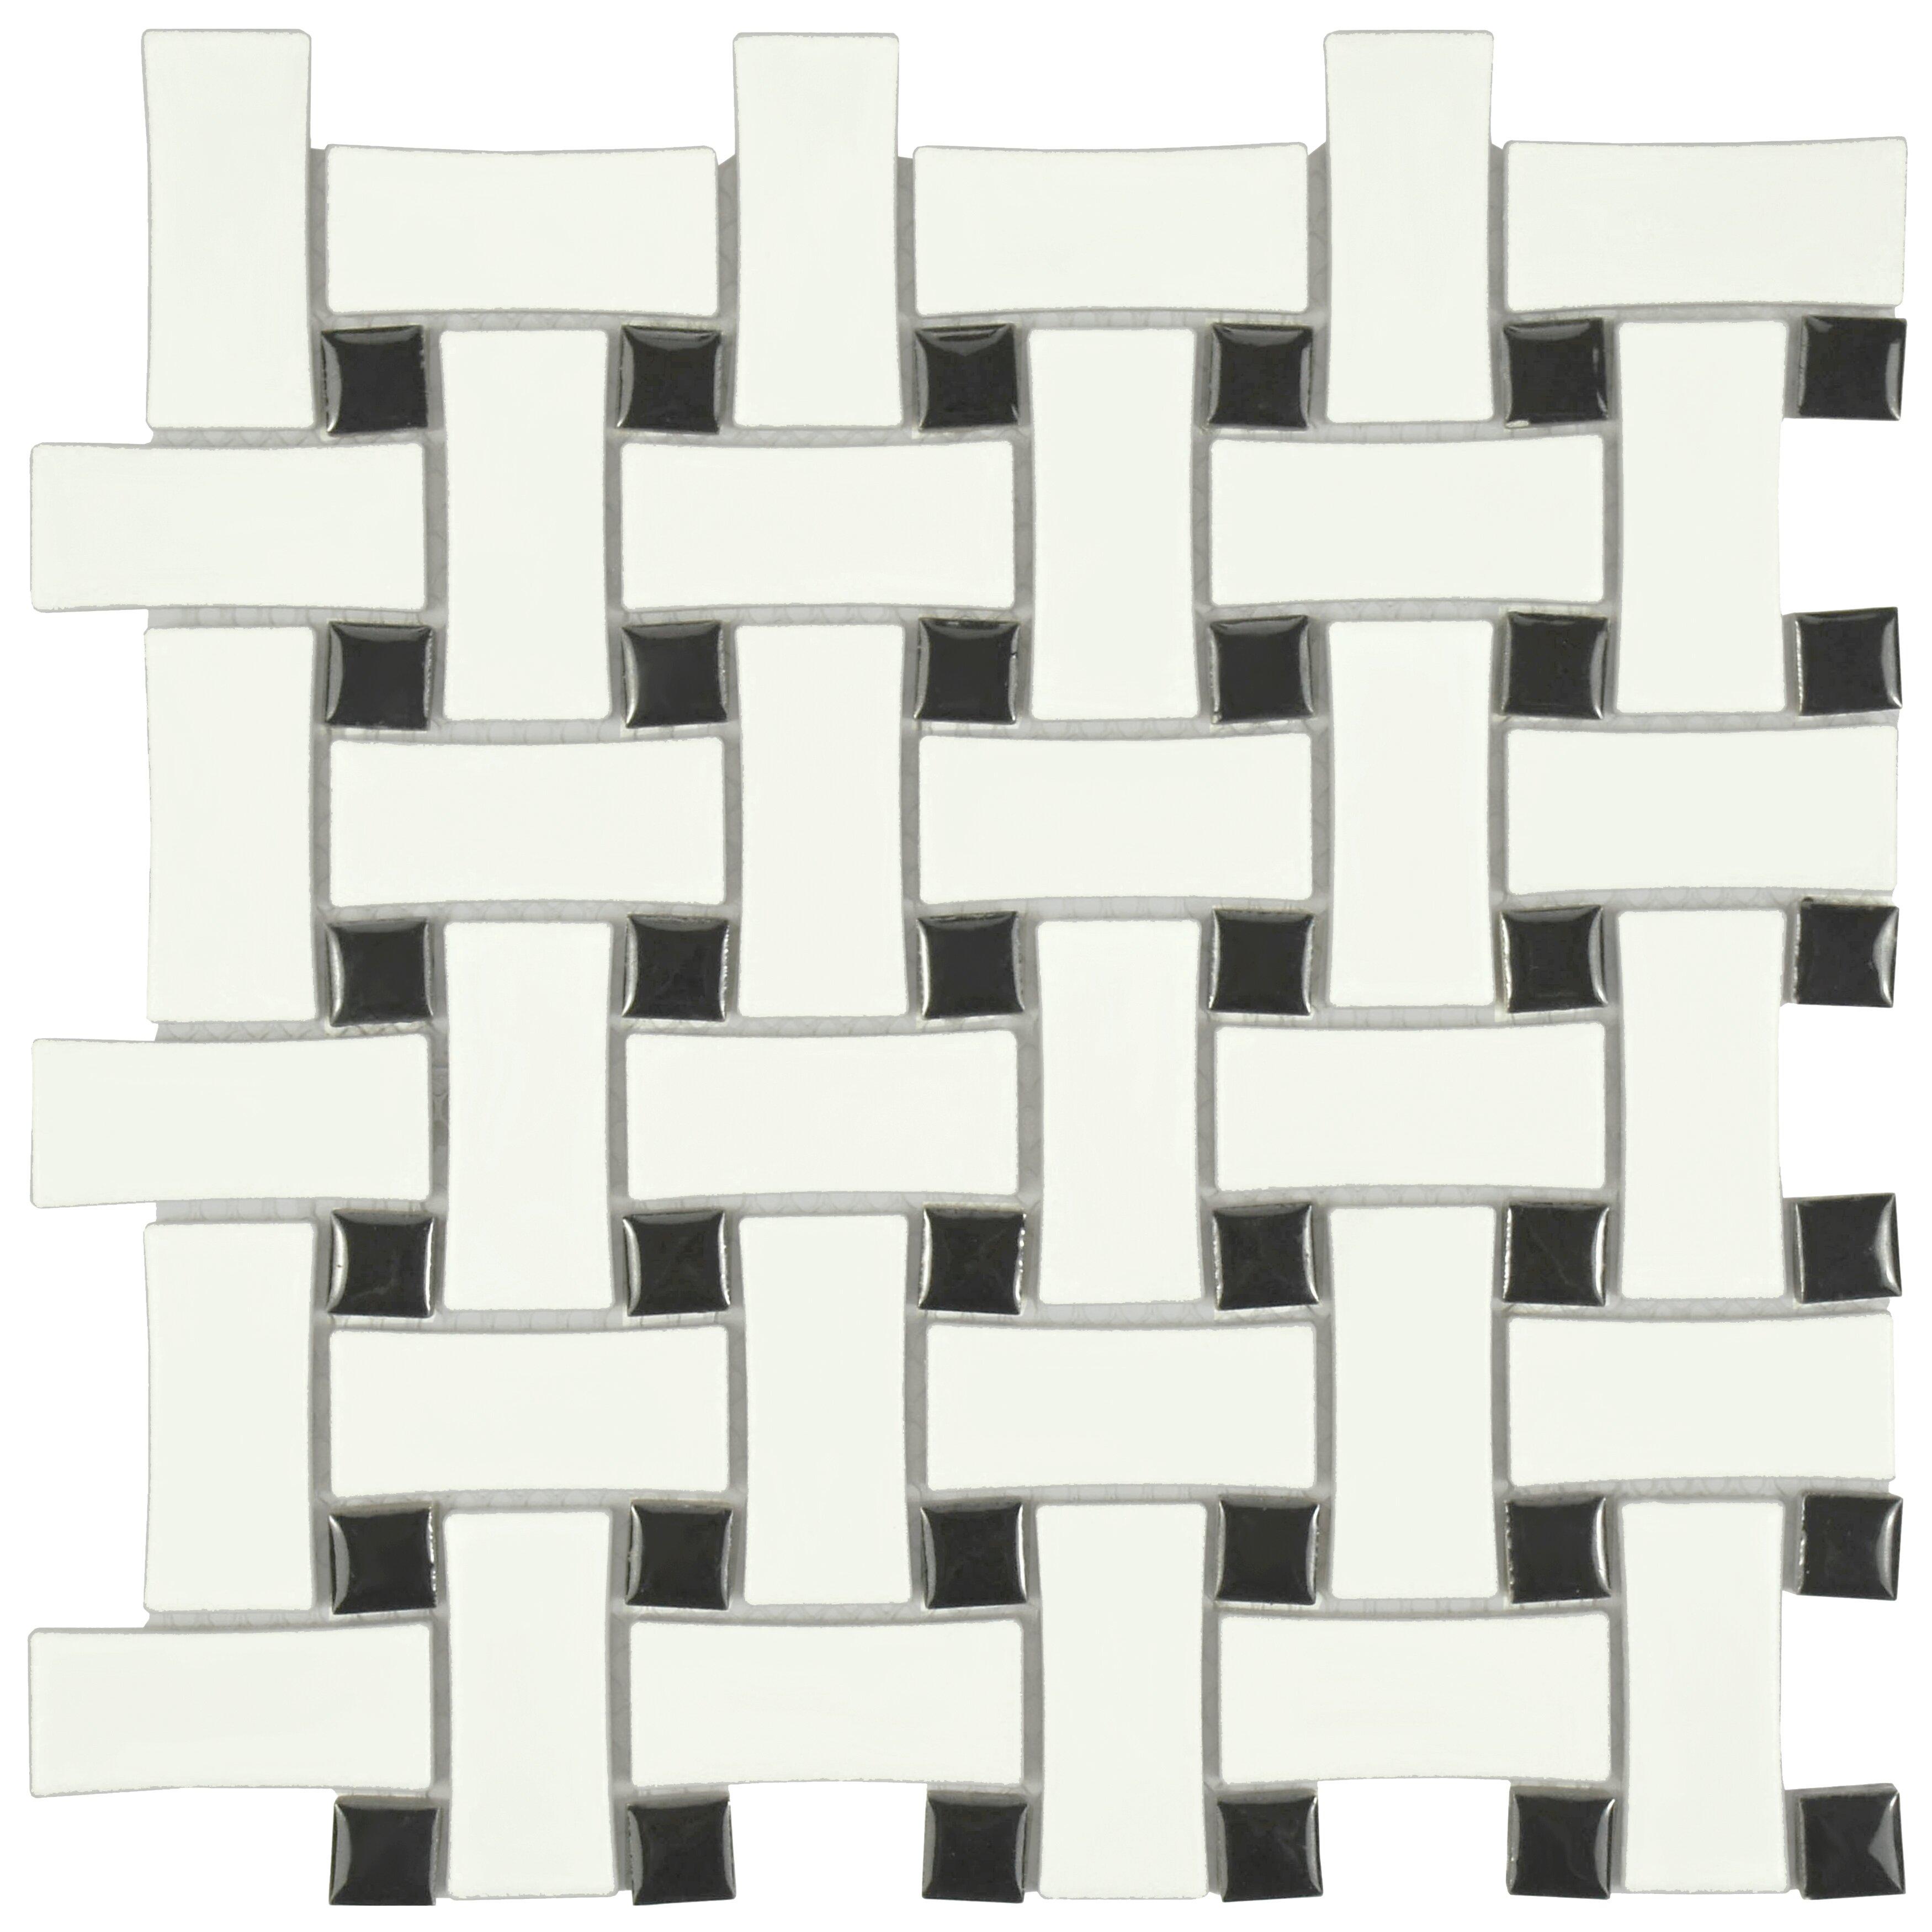 Elitetile retro basket weave 10 5 x 10 5 porcelain Black and white ceramic tile